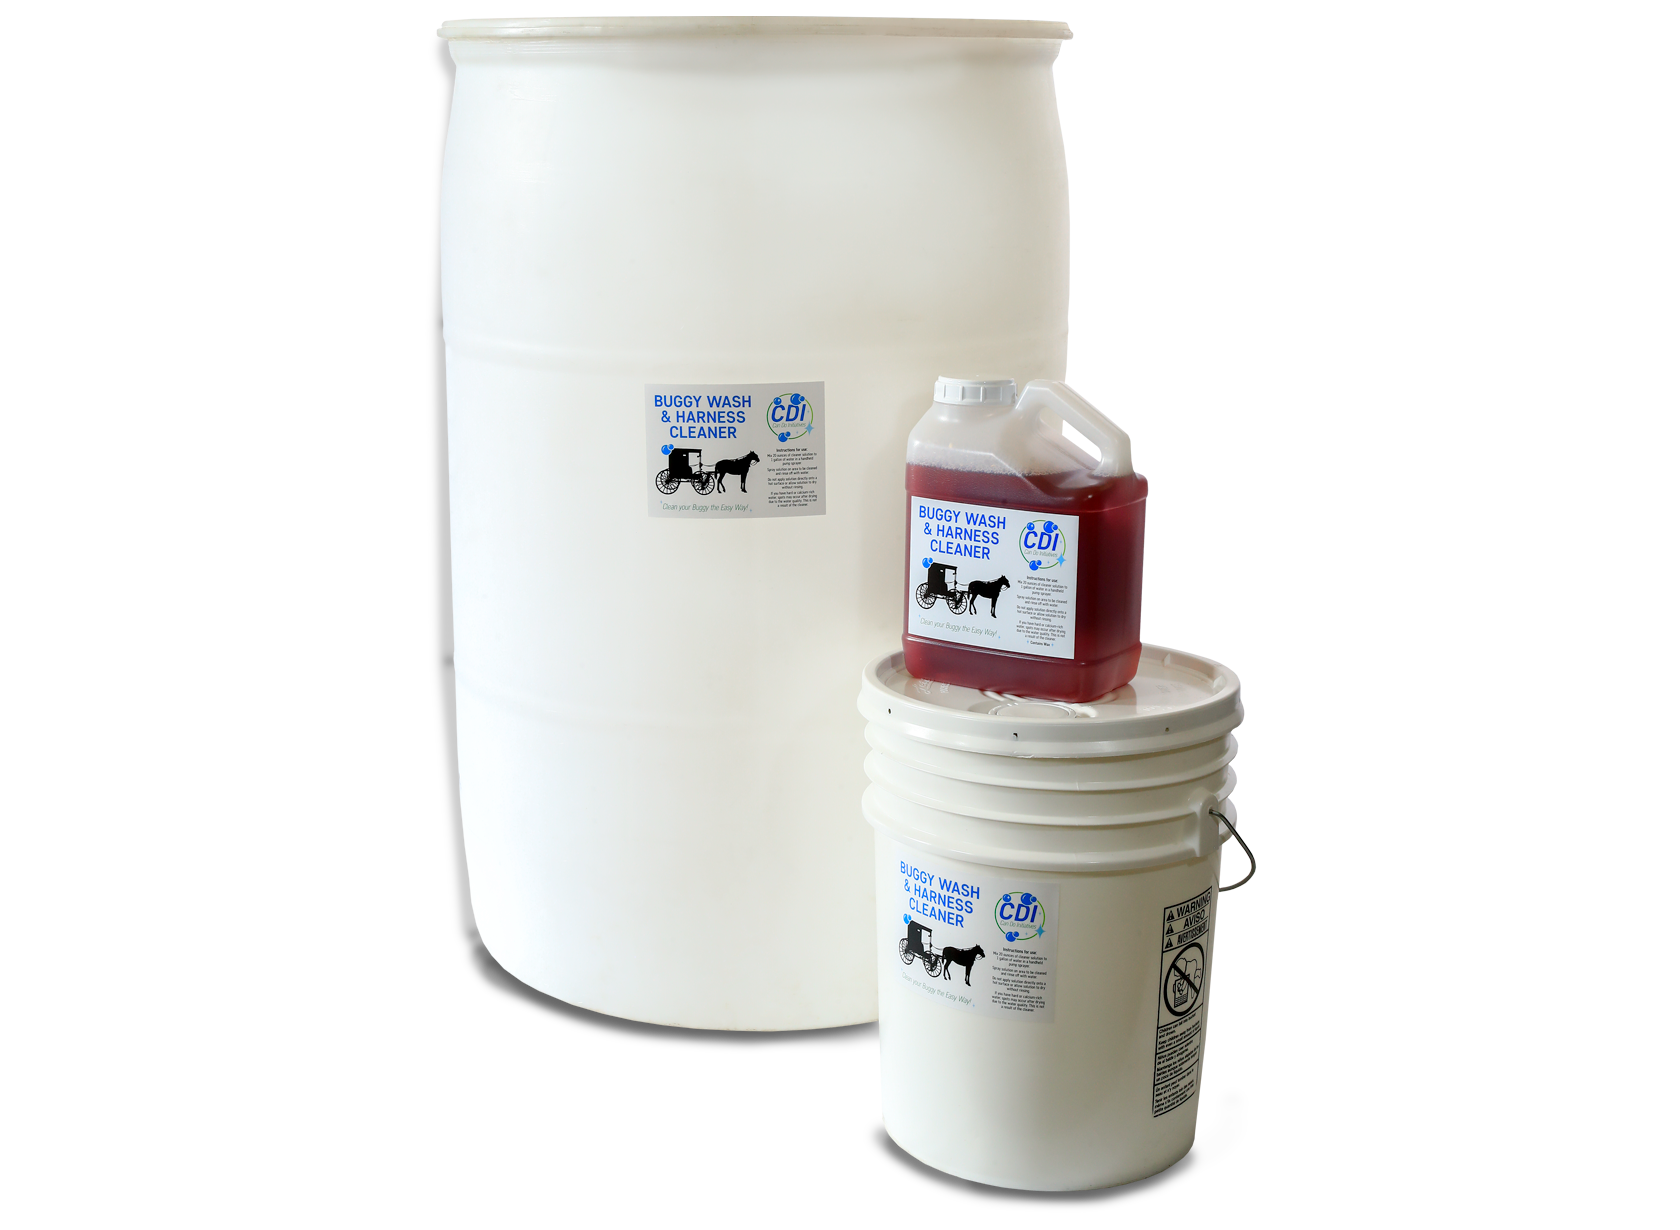 Buggy Wash & Harness Cleaner - 1 Gallon, 5 Gallon, 55 Gallon